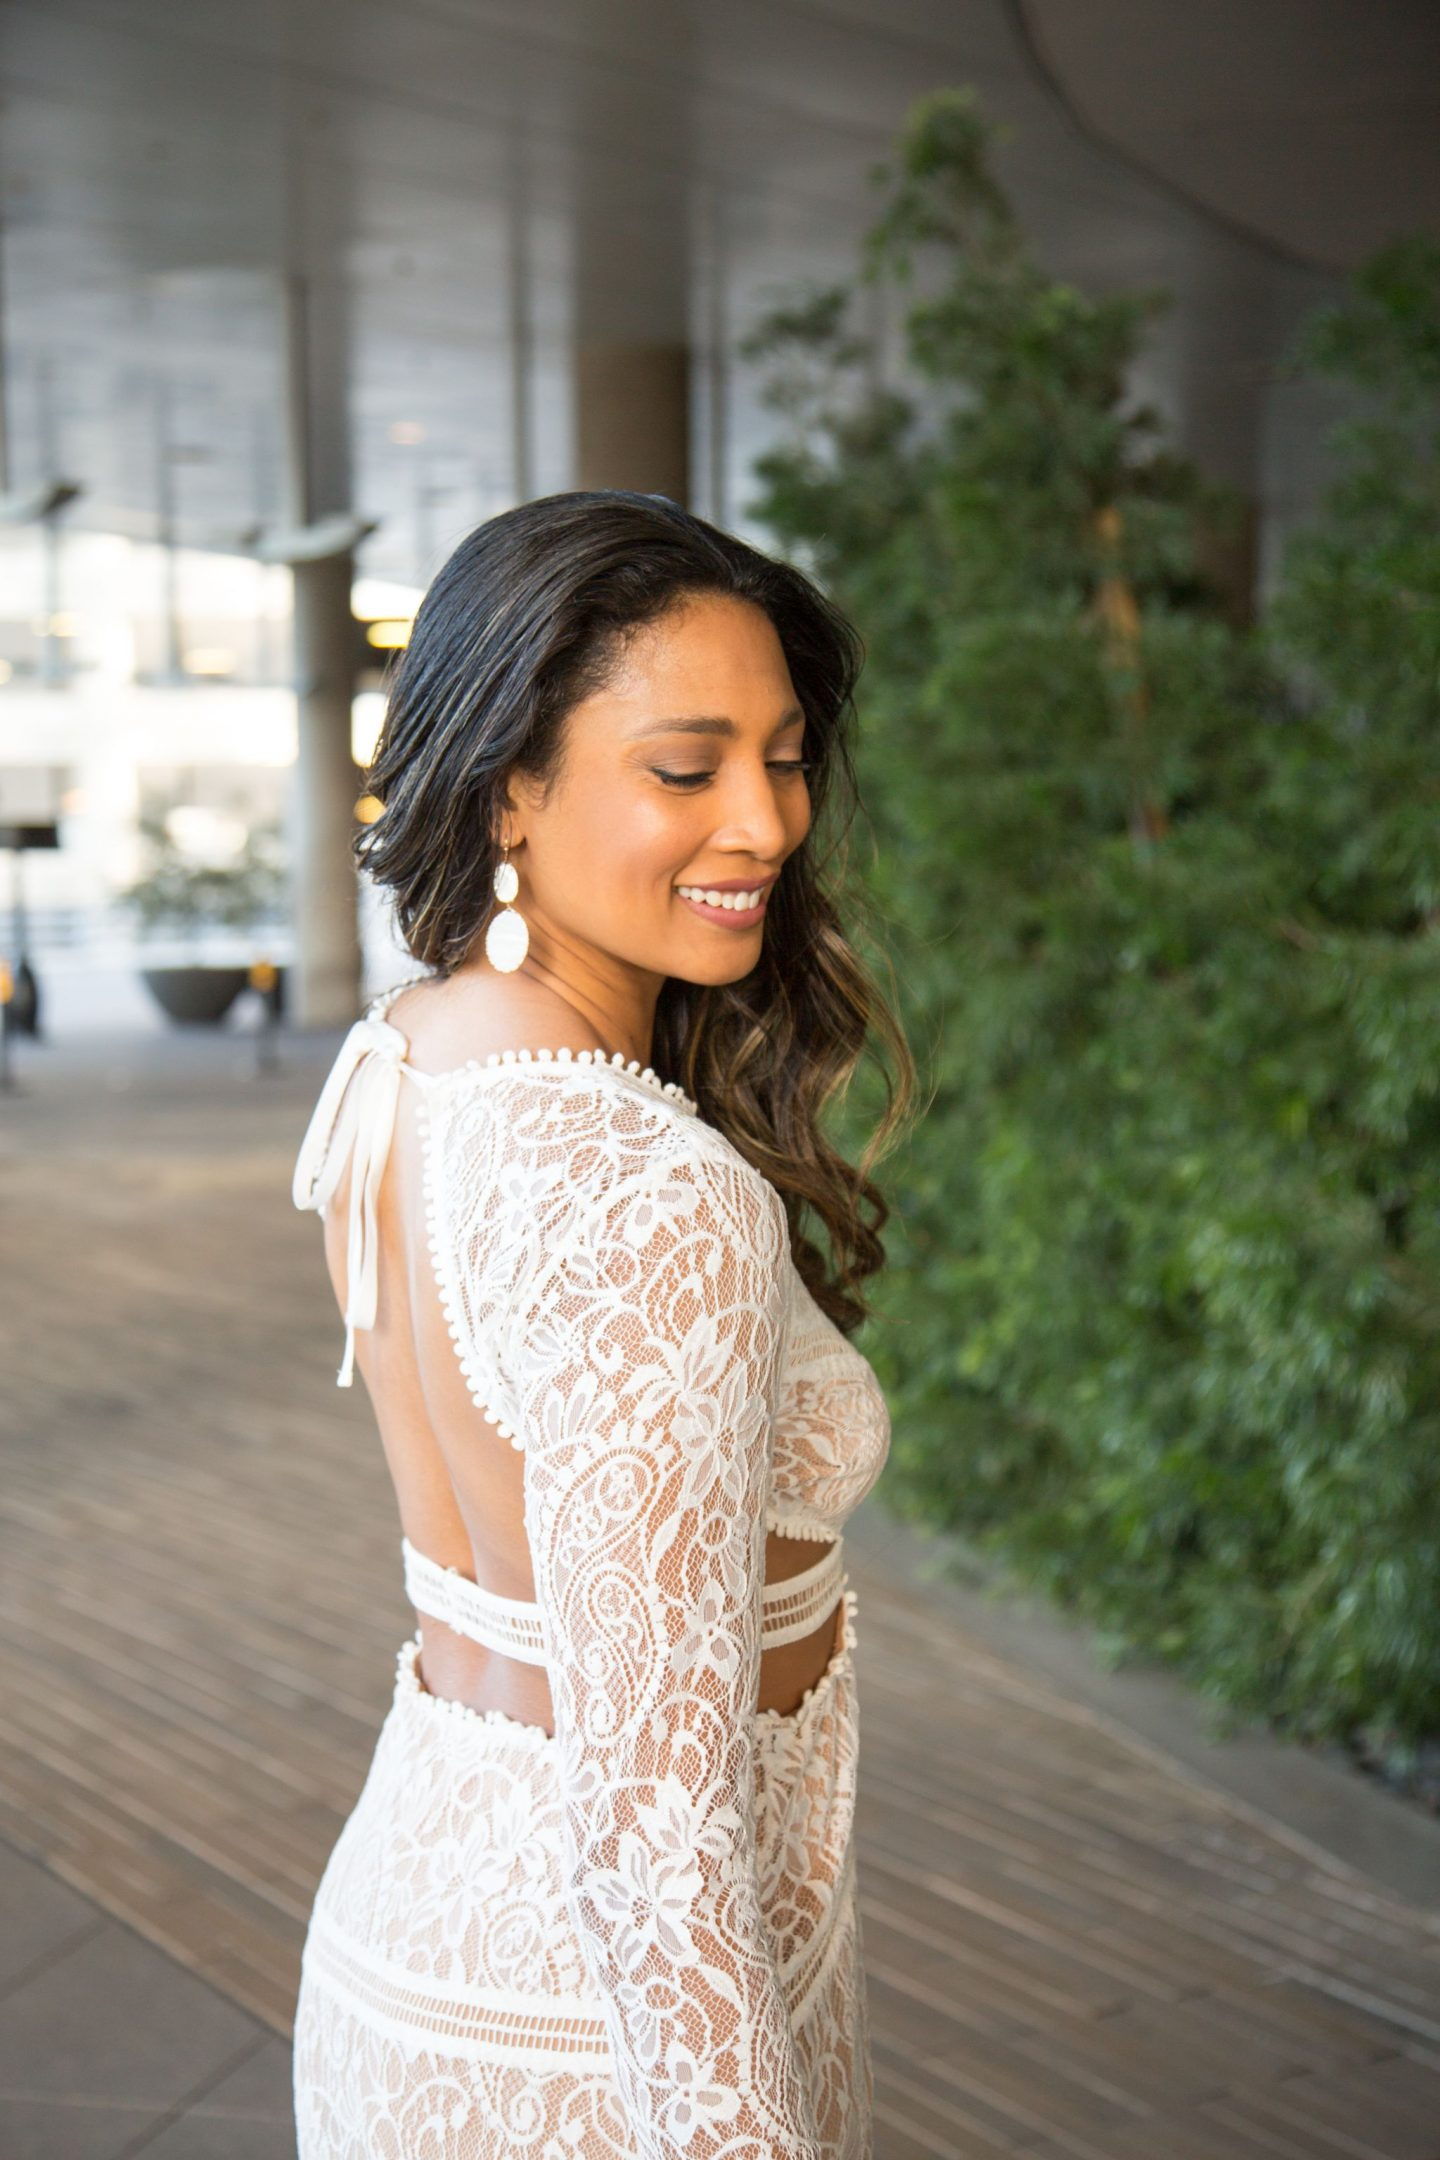 White Cutout Dress,BRIDE TO BE DRESS, BRIDAL SHOWER OUTFIT, WHITE LACE DRESS, SPRING DRESS, SUMMER DRESS, WEDDING DRESS